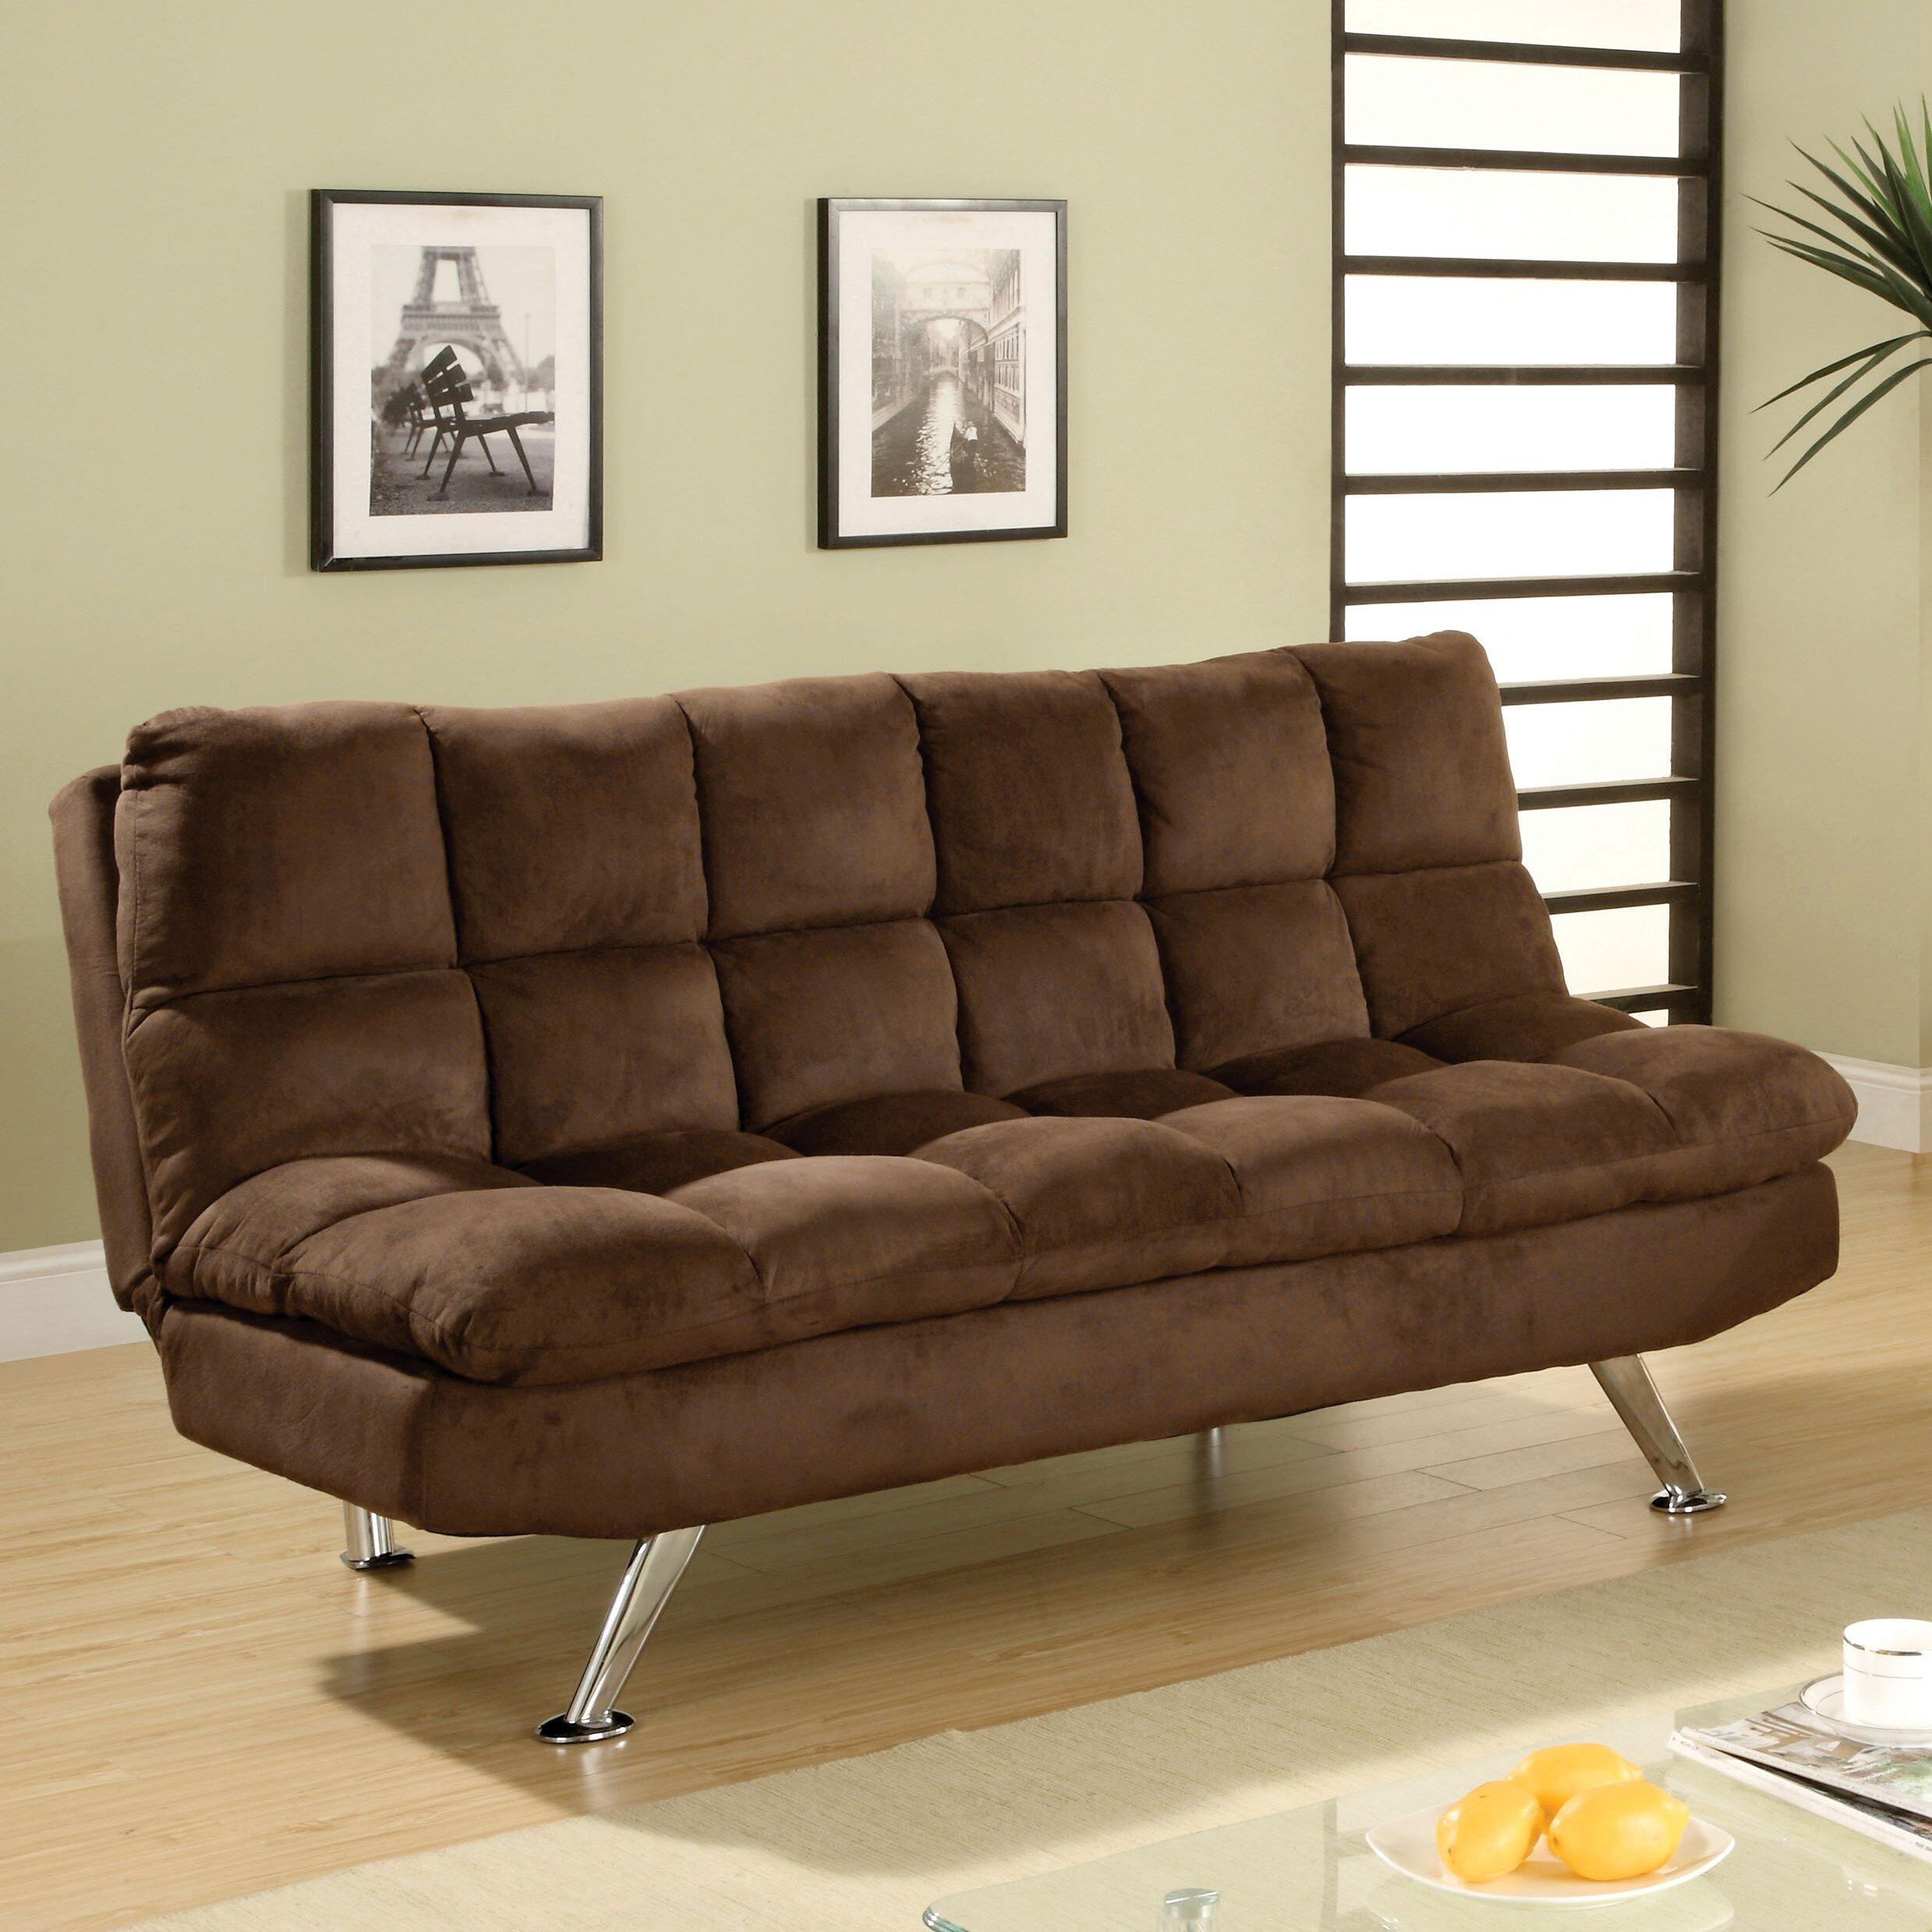 Hokku designs chaz sleeper sofa reviews wayfair for Hokku designs living room furniture